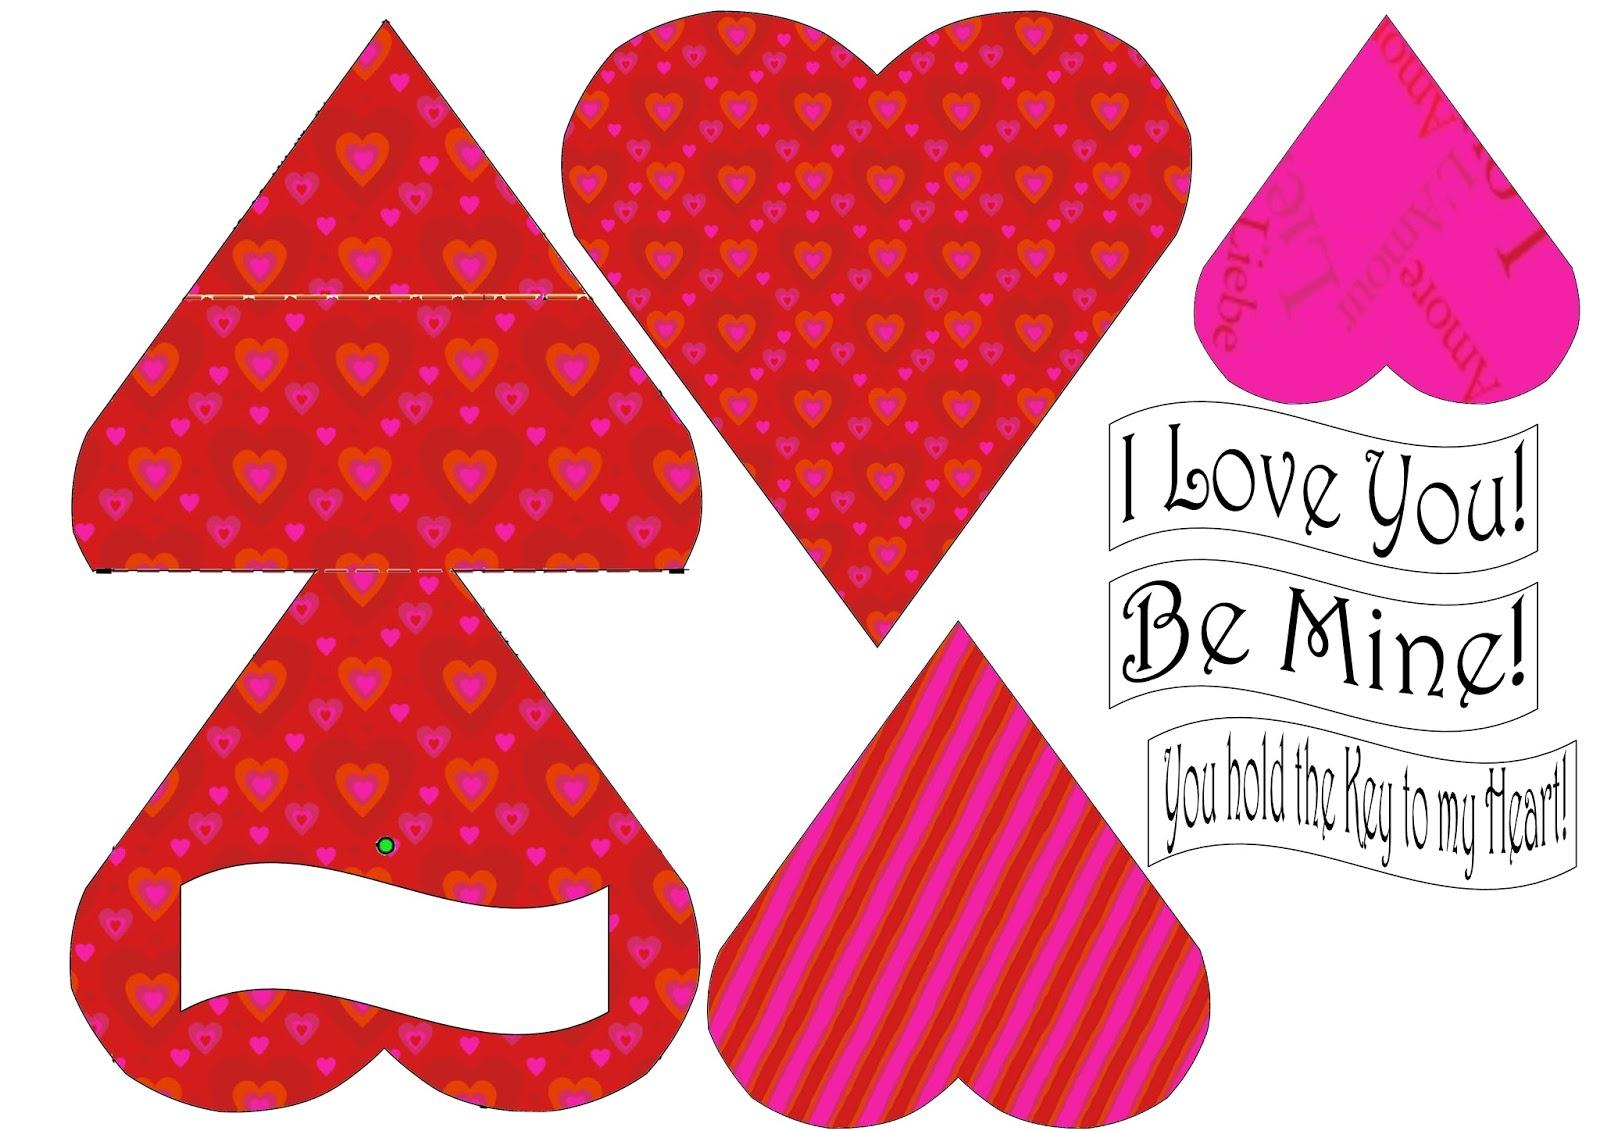 http://1.bp.blogspot.com/-E1R9r4hpi78/UubCNzUvdZI/AAAAAAAARuI/T6VYOaiT2EE/s1600/Heart+Easel+card+by+Trimgym.jpg